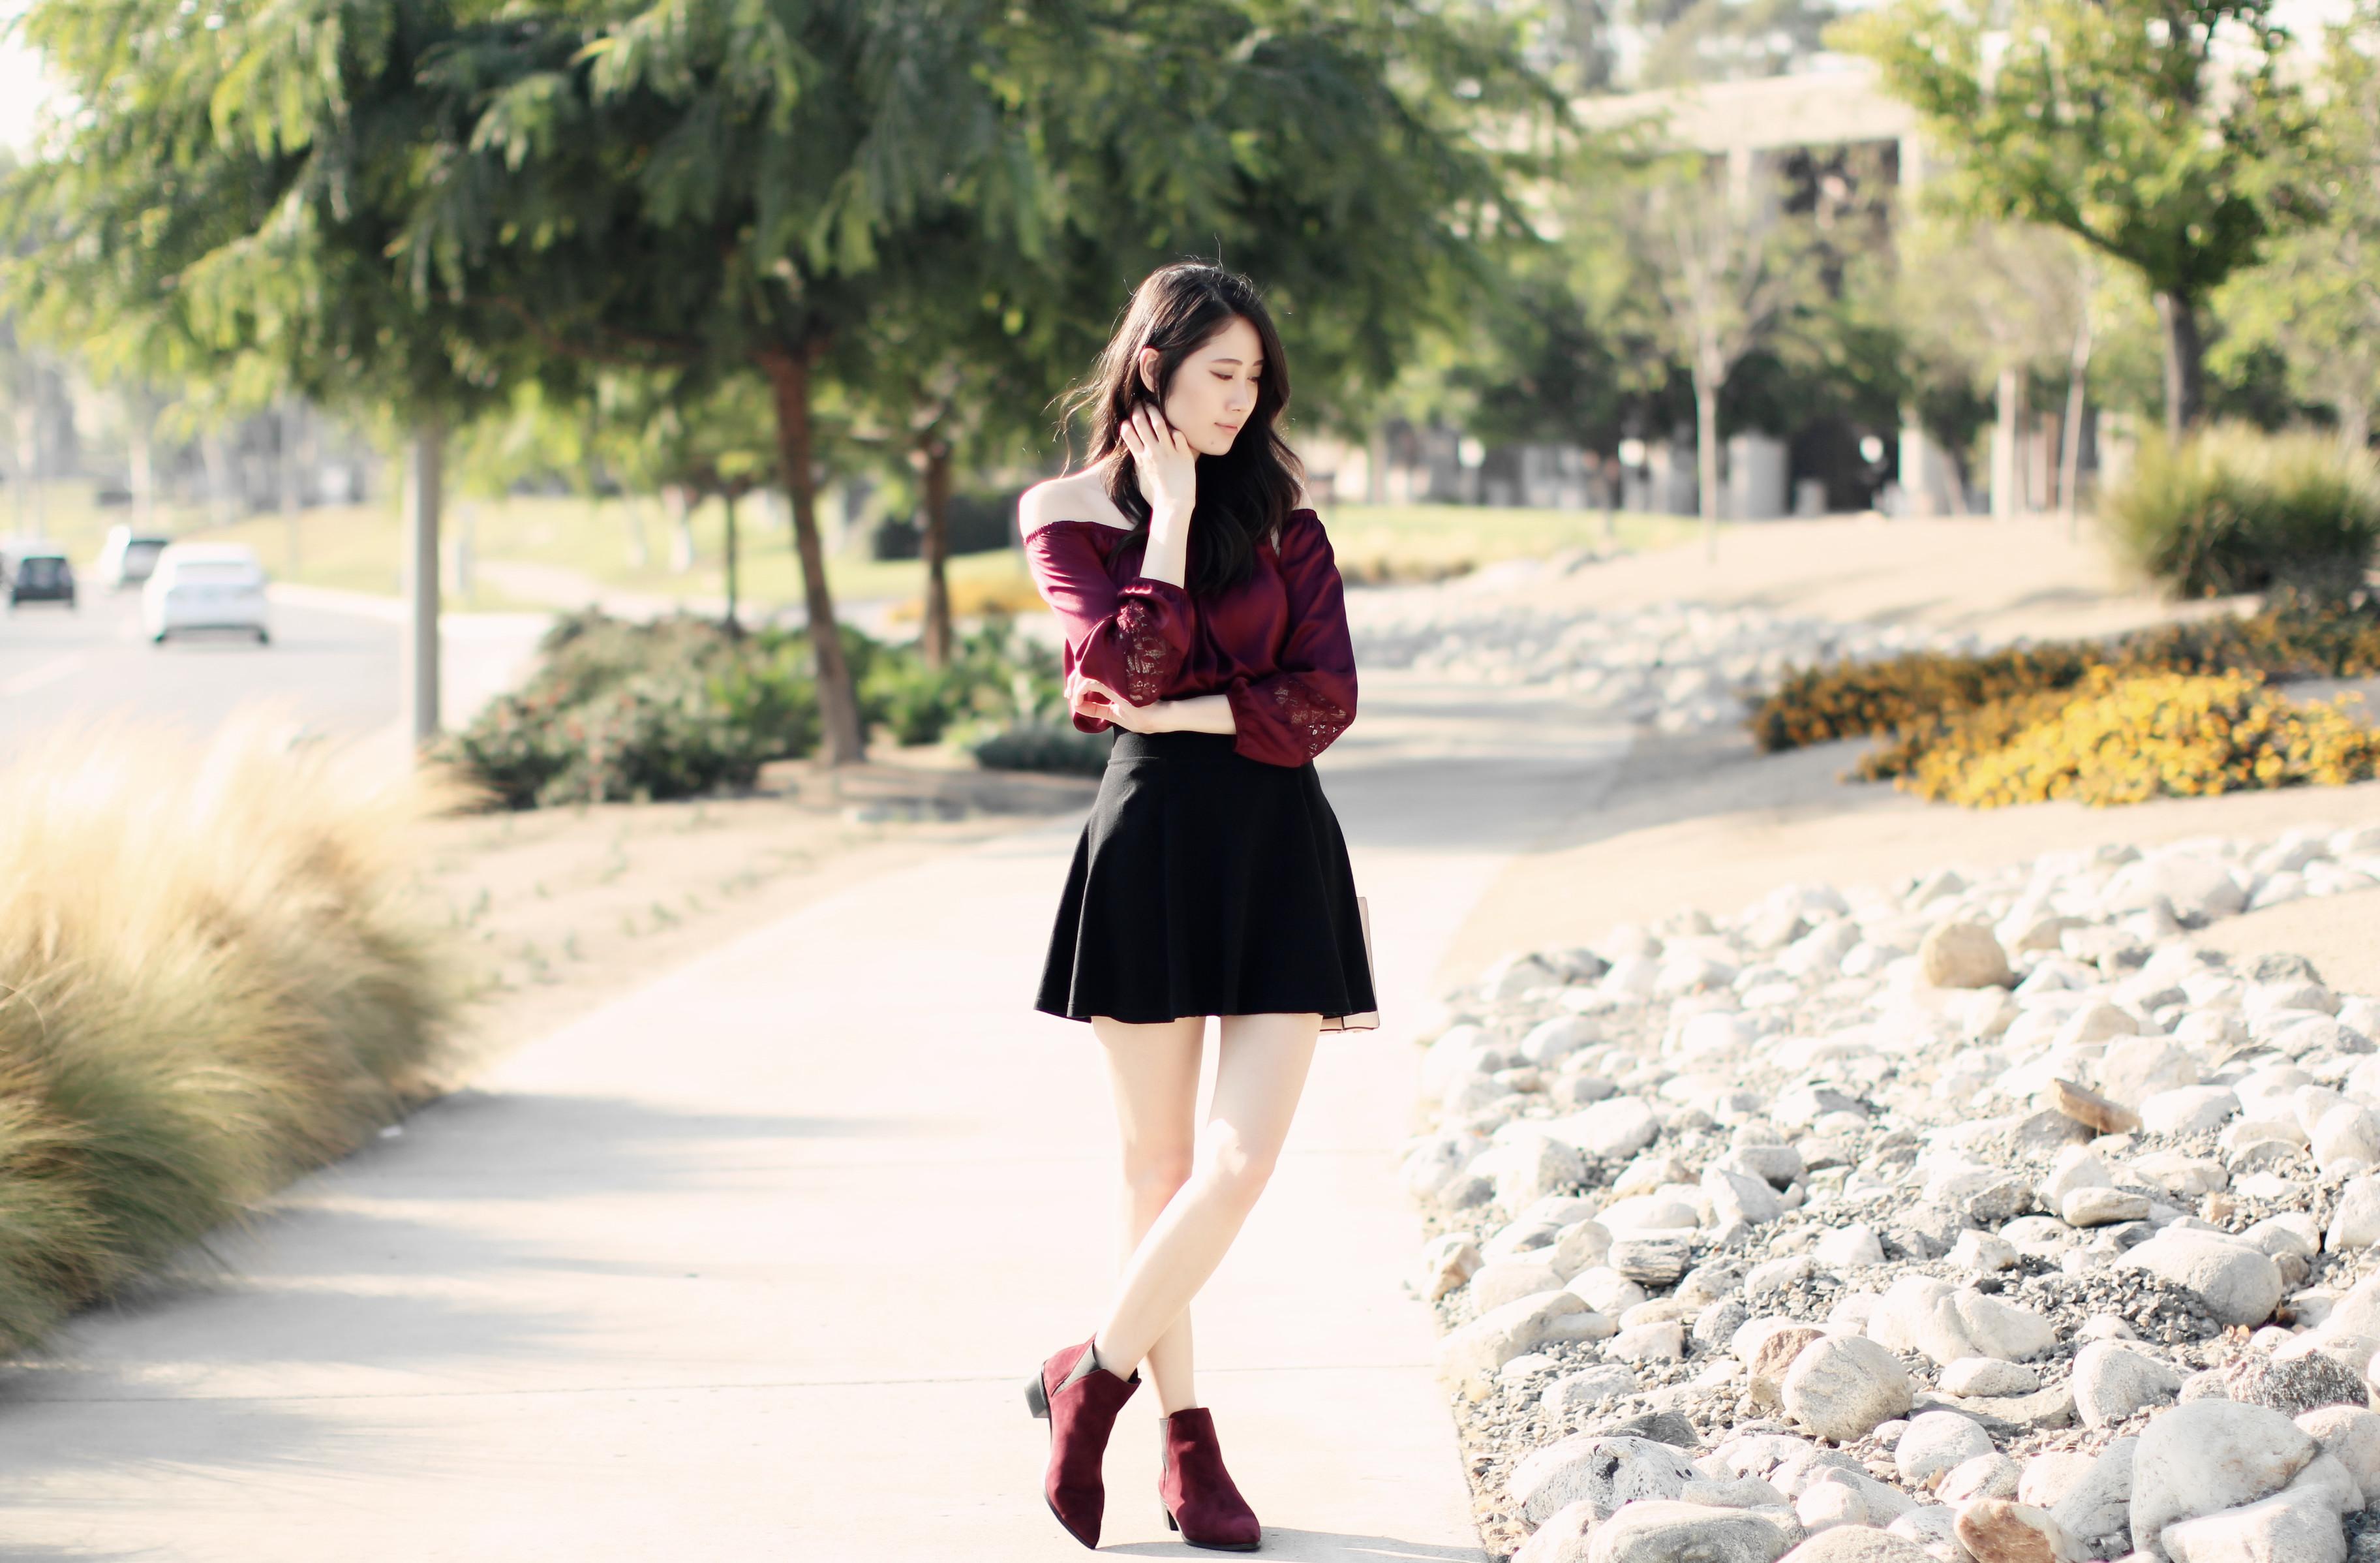 3574-ootd-fashion-style-outfitoftheday-wiwt-silk-lace-fallfashion-forever21-f21xme-elizabeeetht-clothestoyouuu